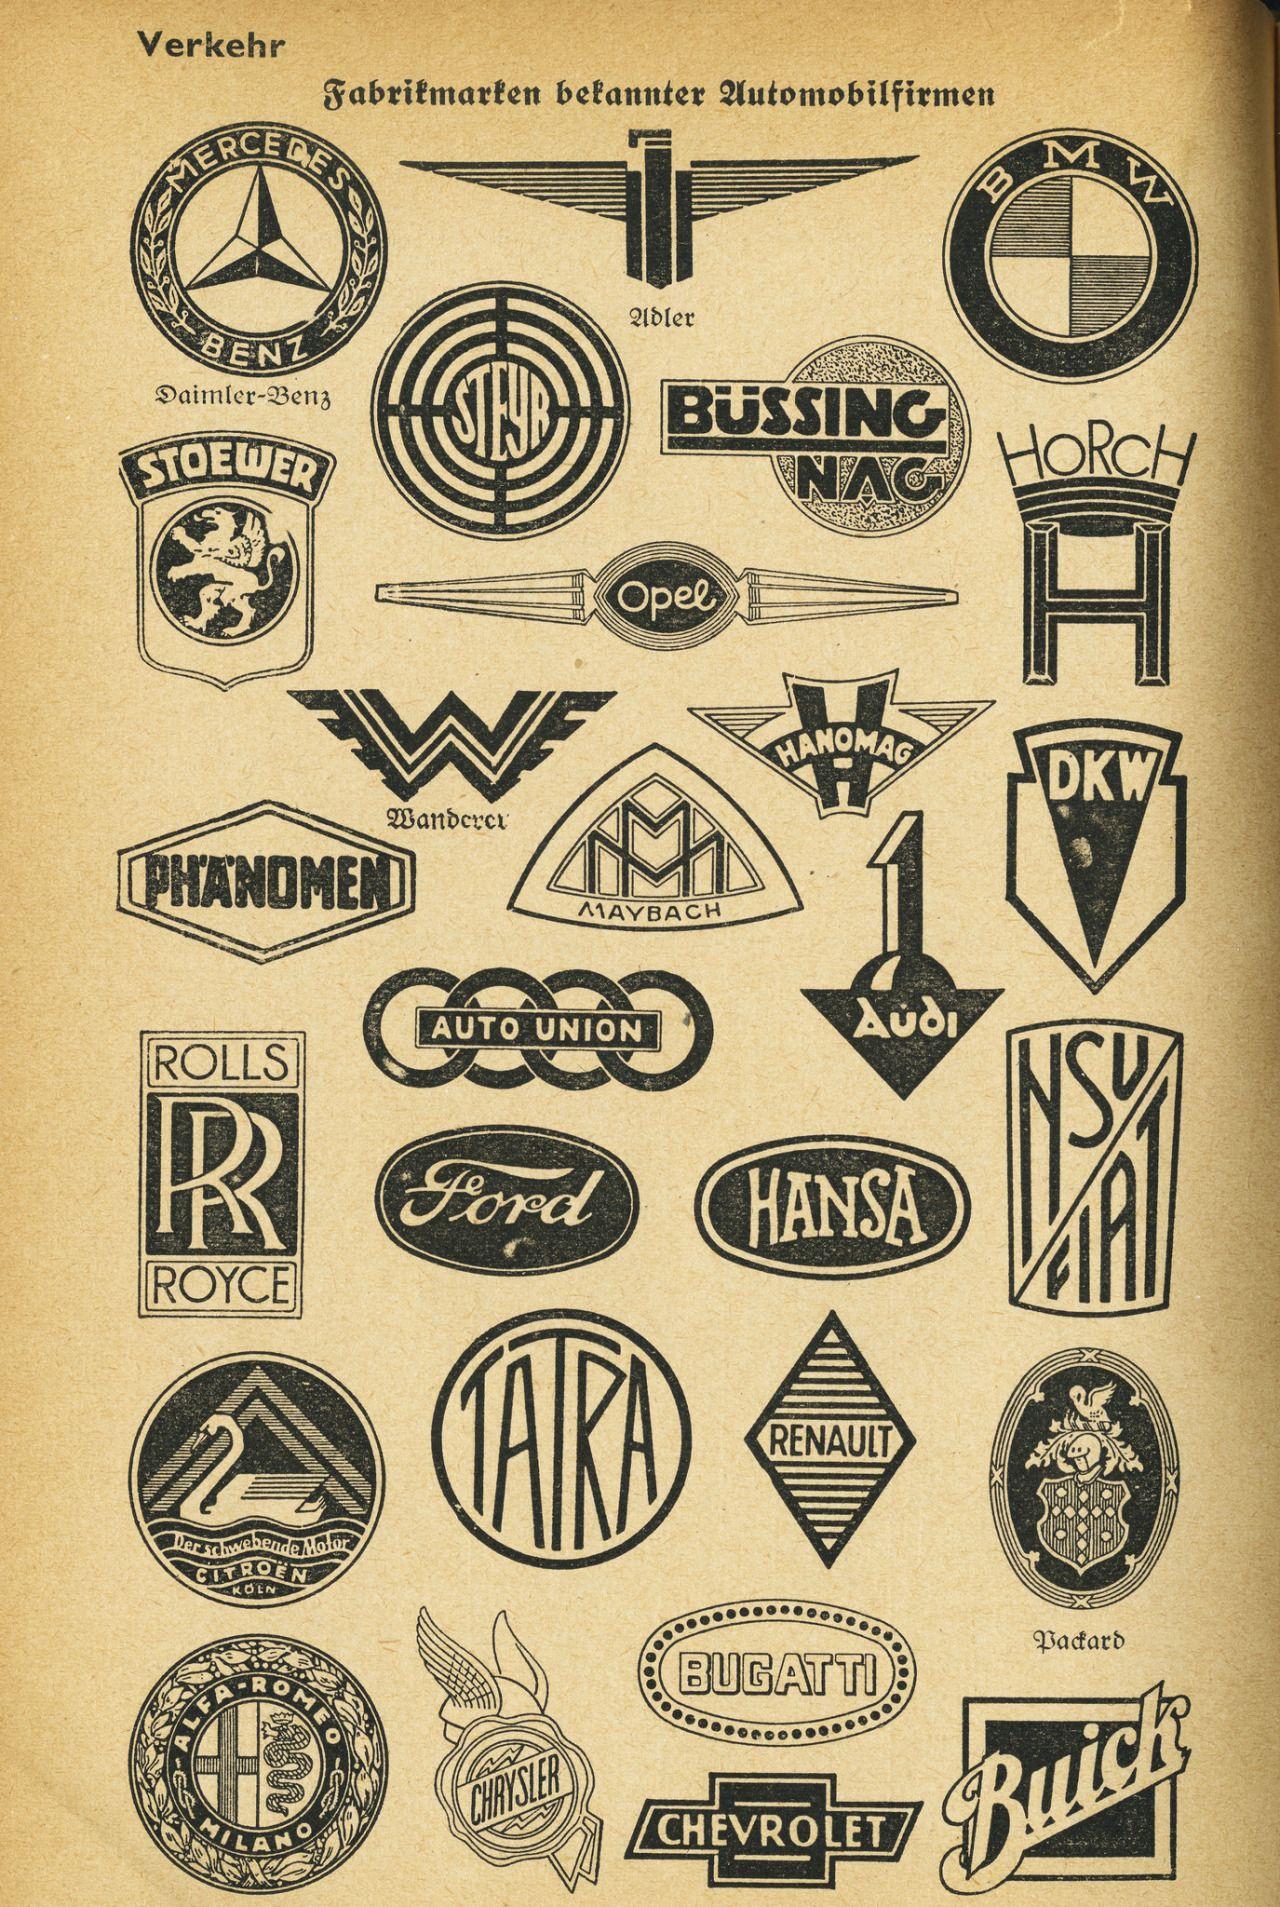 Pin By Romulus Dozier On Giants Car Brands Logos Car Logos Car Badges